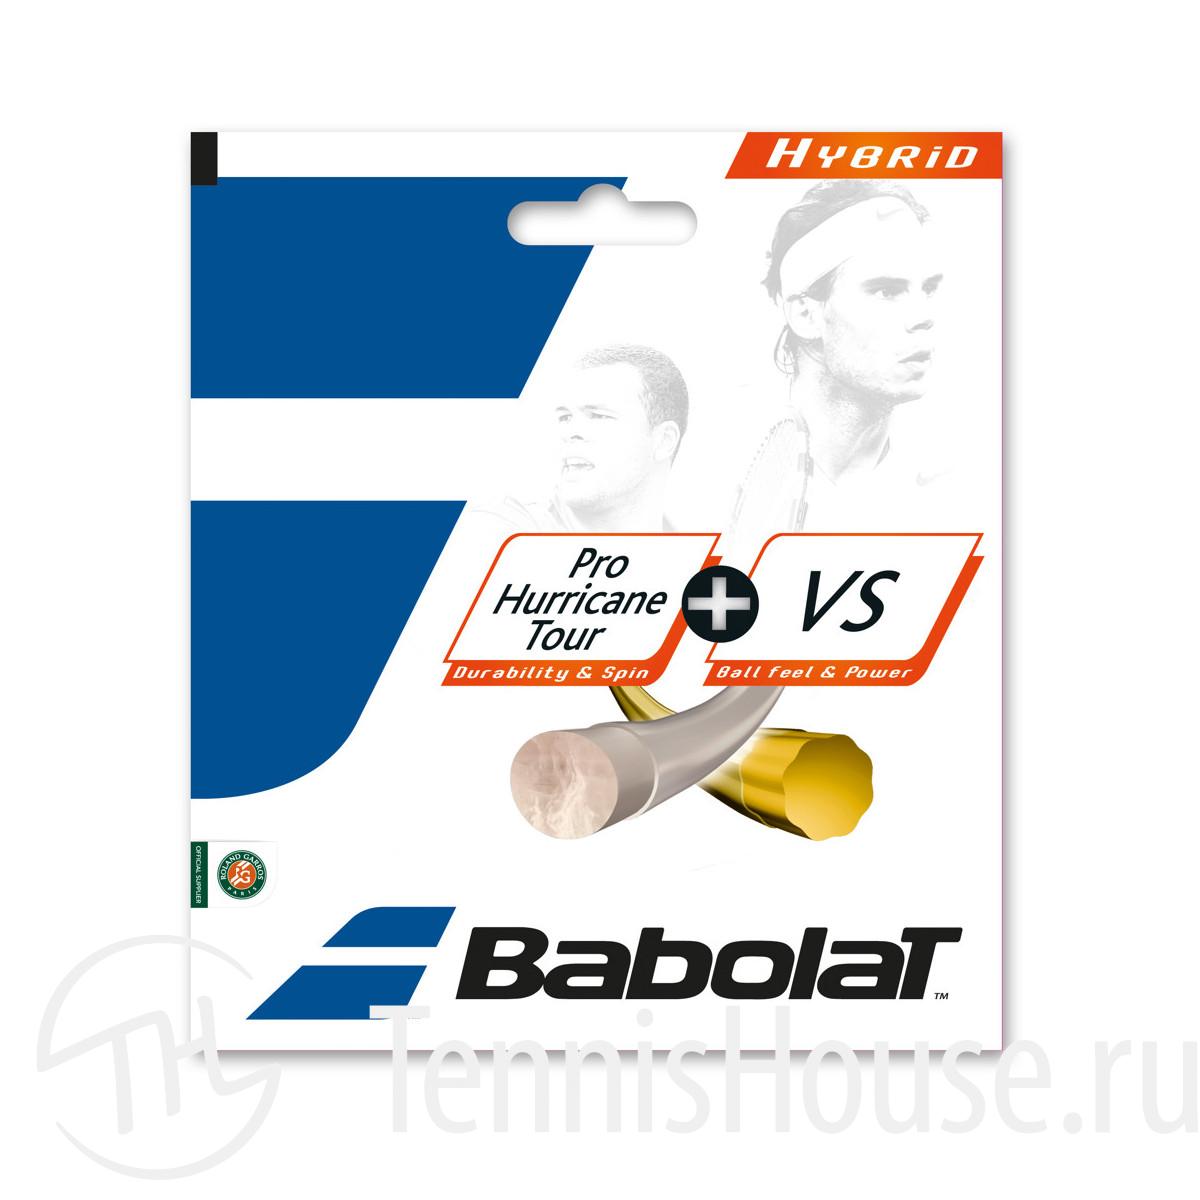 Babolat Гибрид Pro Hurricane Tour 130 + VS 130 281031